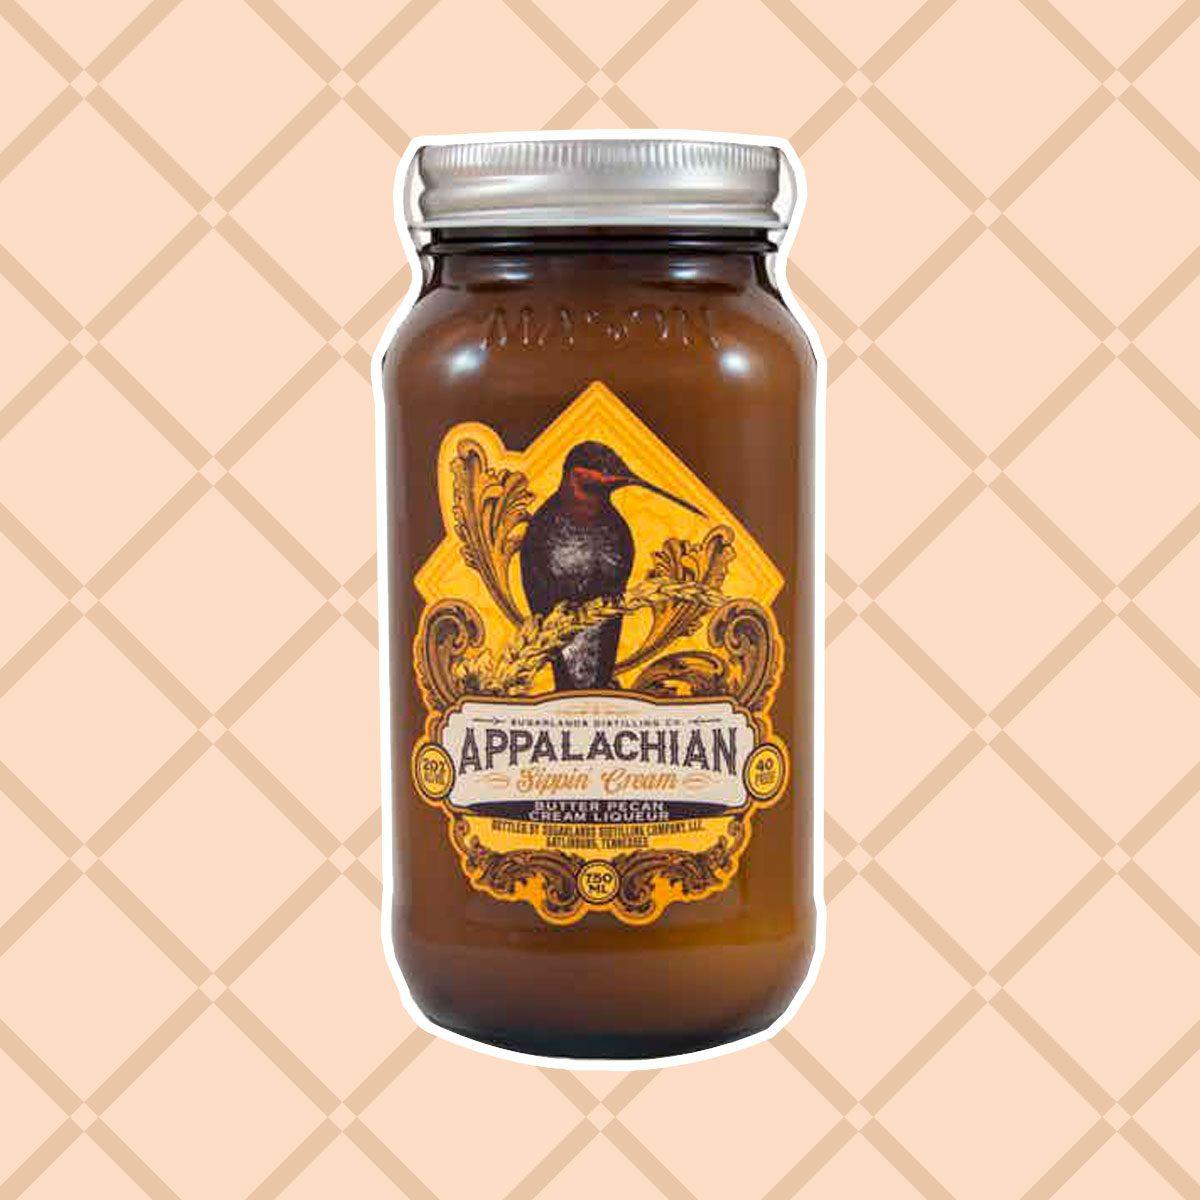 Sugarlands Appalachian Sipping Butter Pecan Cream Liqueur